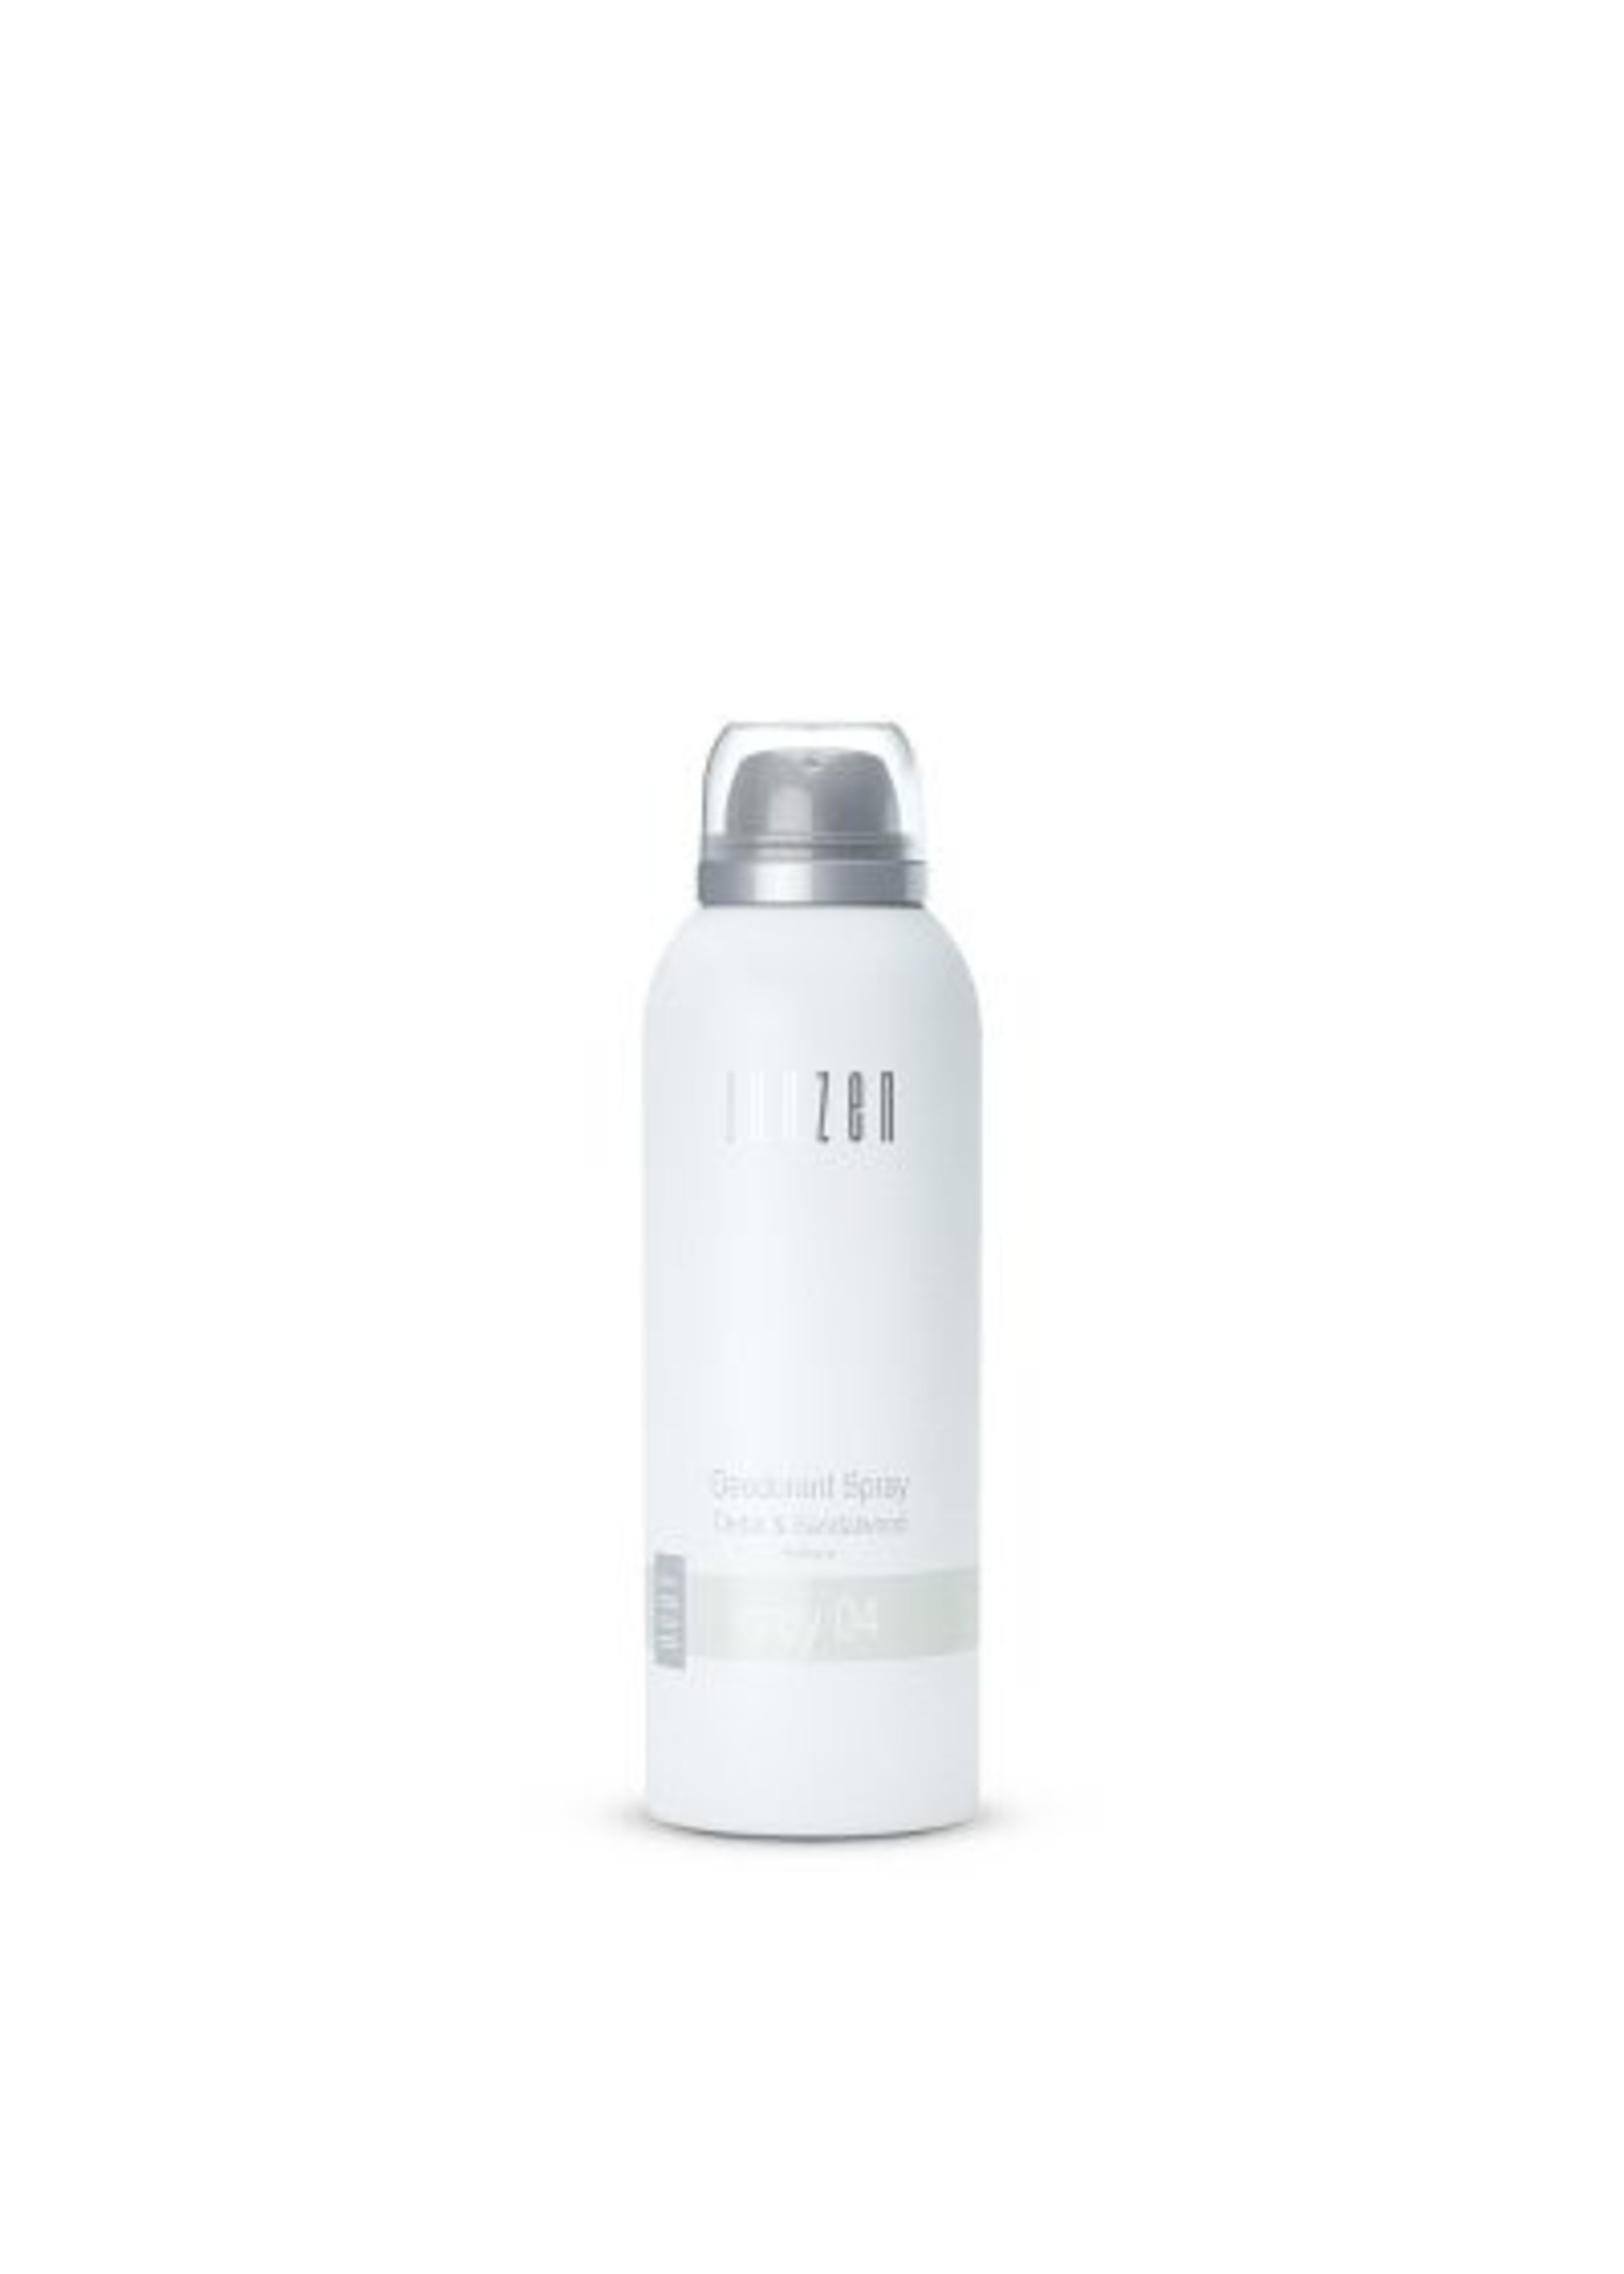 Janzen JANZEN Deodorant Spray Grey 04